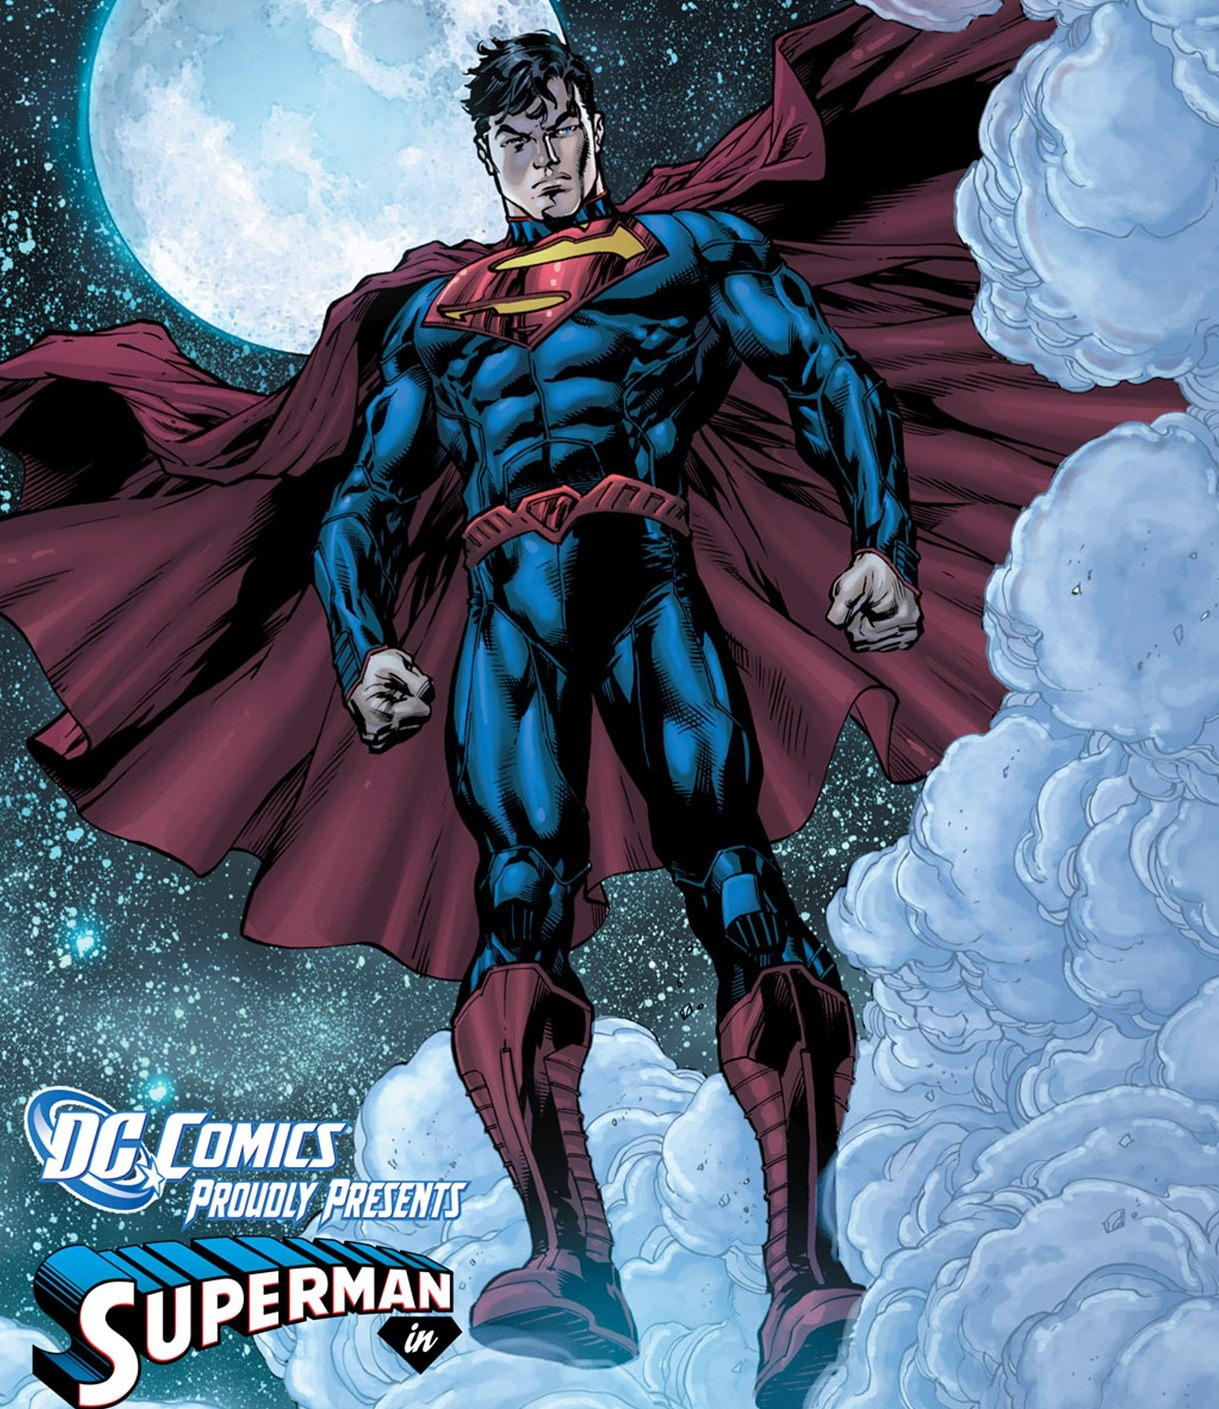 http://2.bp.blogspot.com/-Wtma36EUDUQ/Tvpx6Ki__UI/AAAAAAAAA6M/s_8cCzMag38/s1600/dc-new-52-superman.jpg